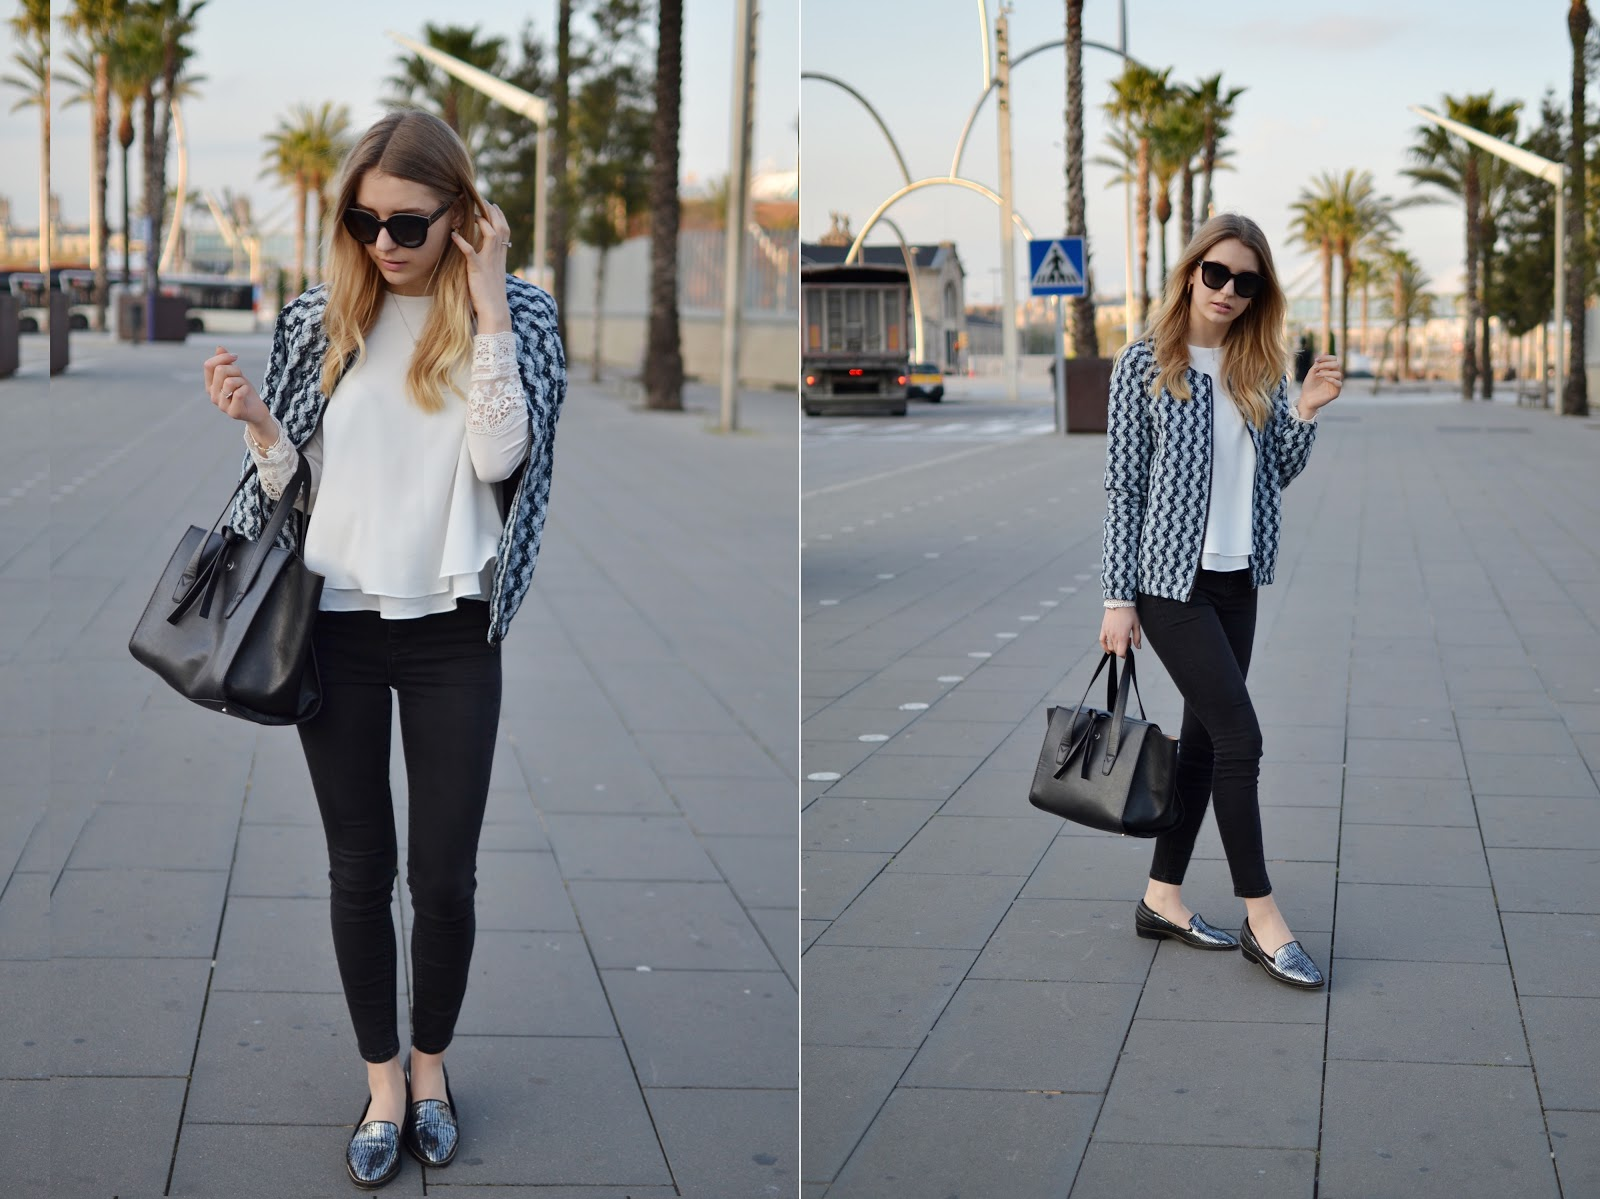 Latviesu modes blogeri